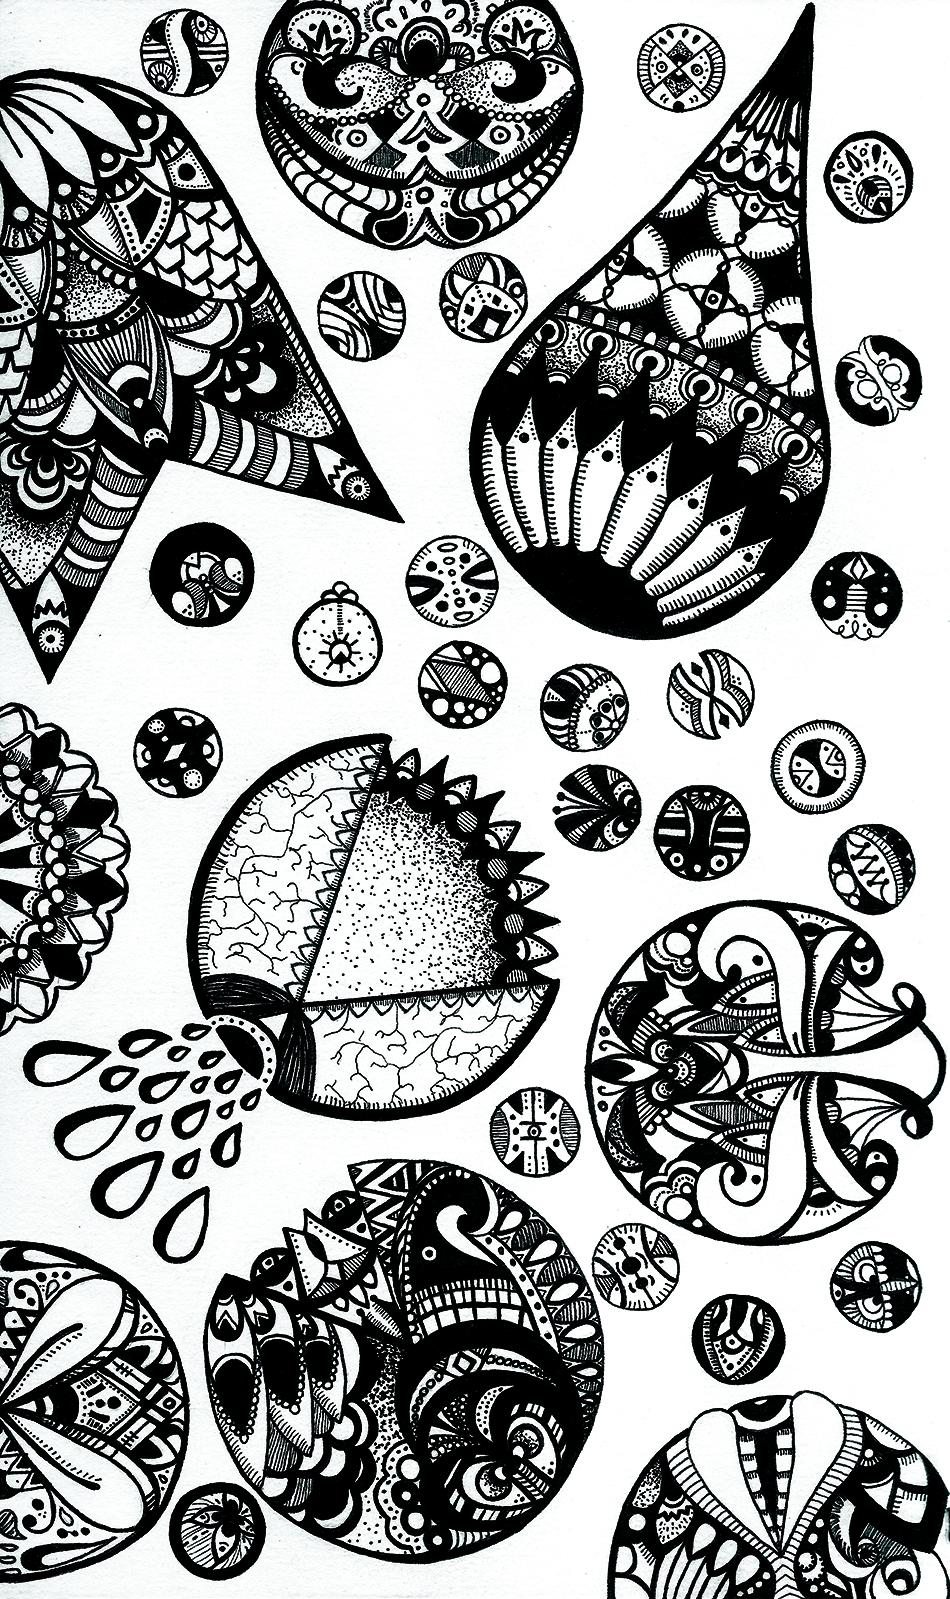 """Balloons"" (2013) digital version of original work in pen on paper"